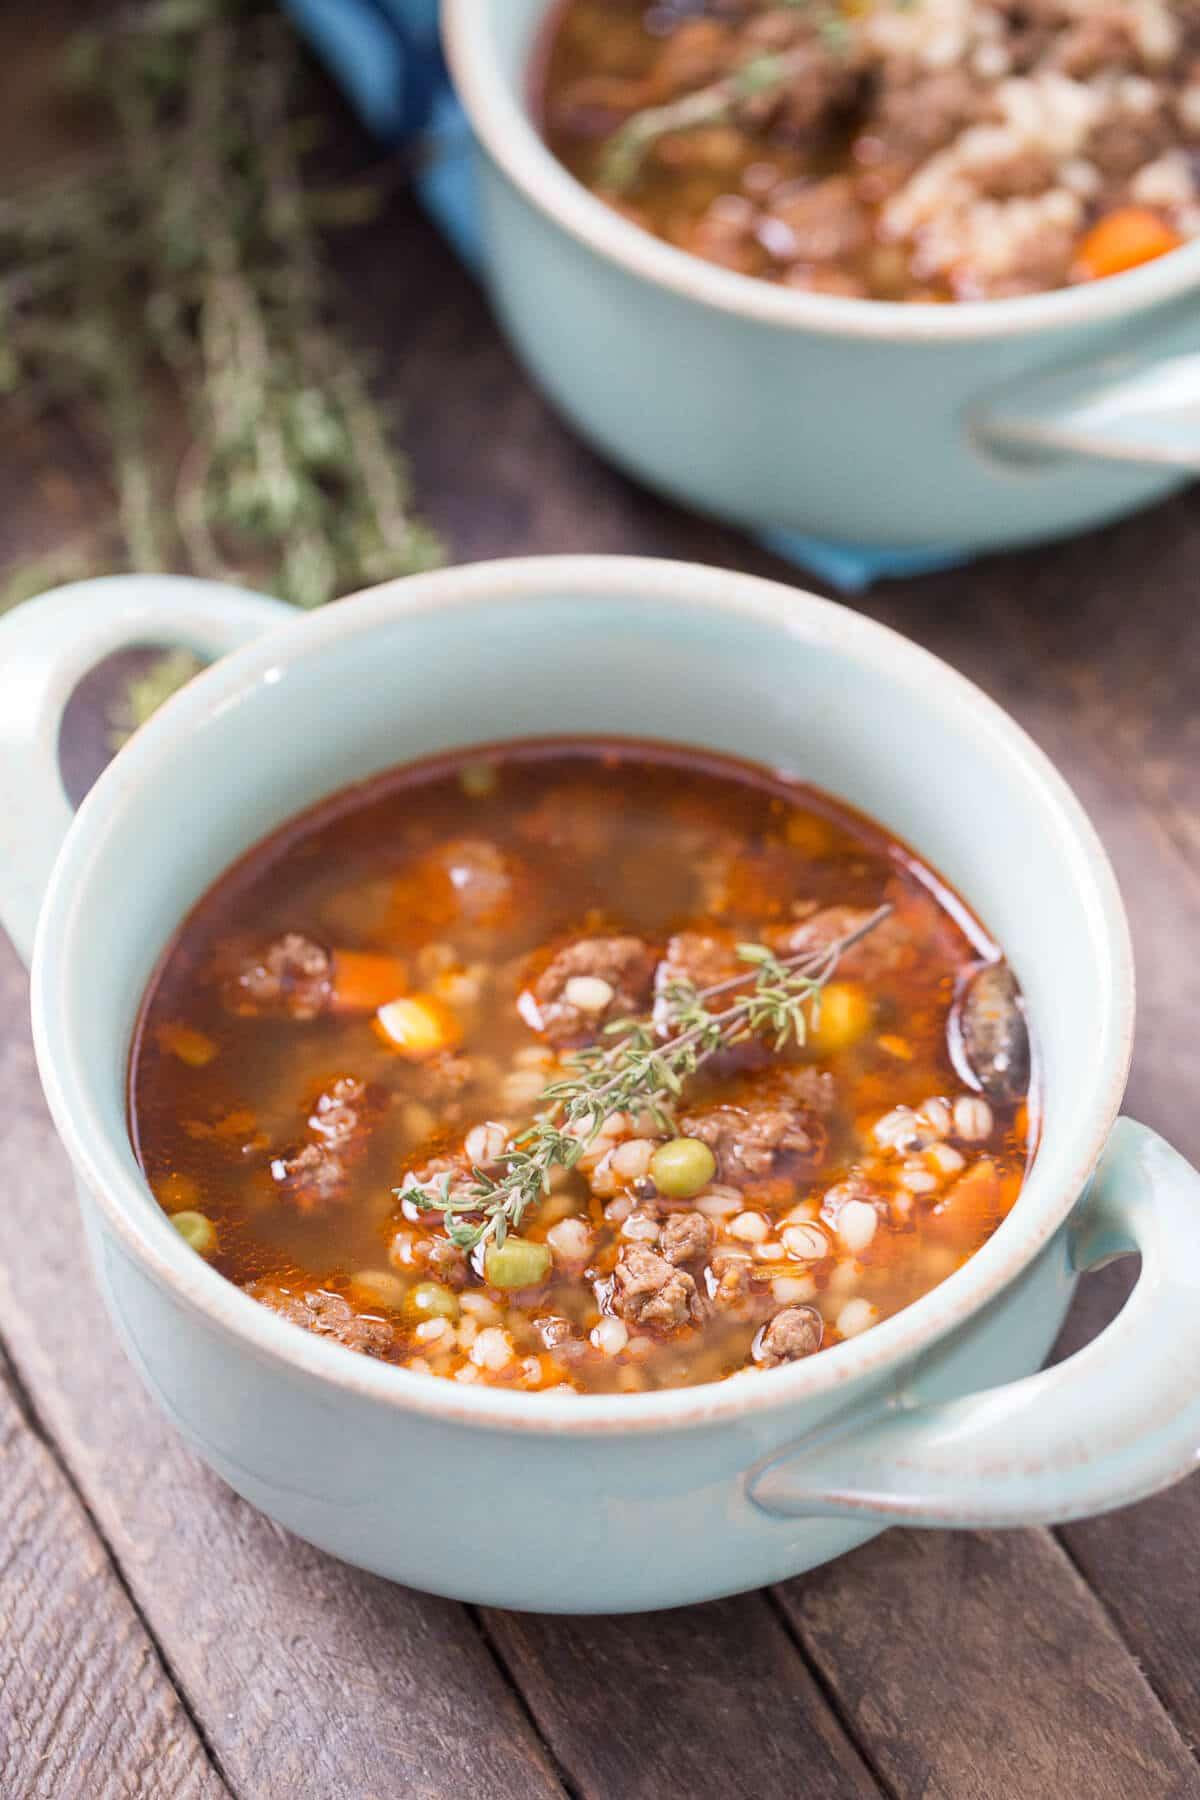 Barley Soup Recipes  Slow Cooker Beef and Barley Soup Recipe LemonsforLulu